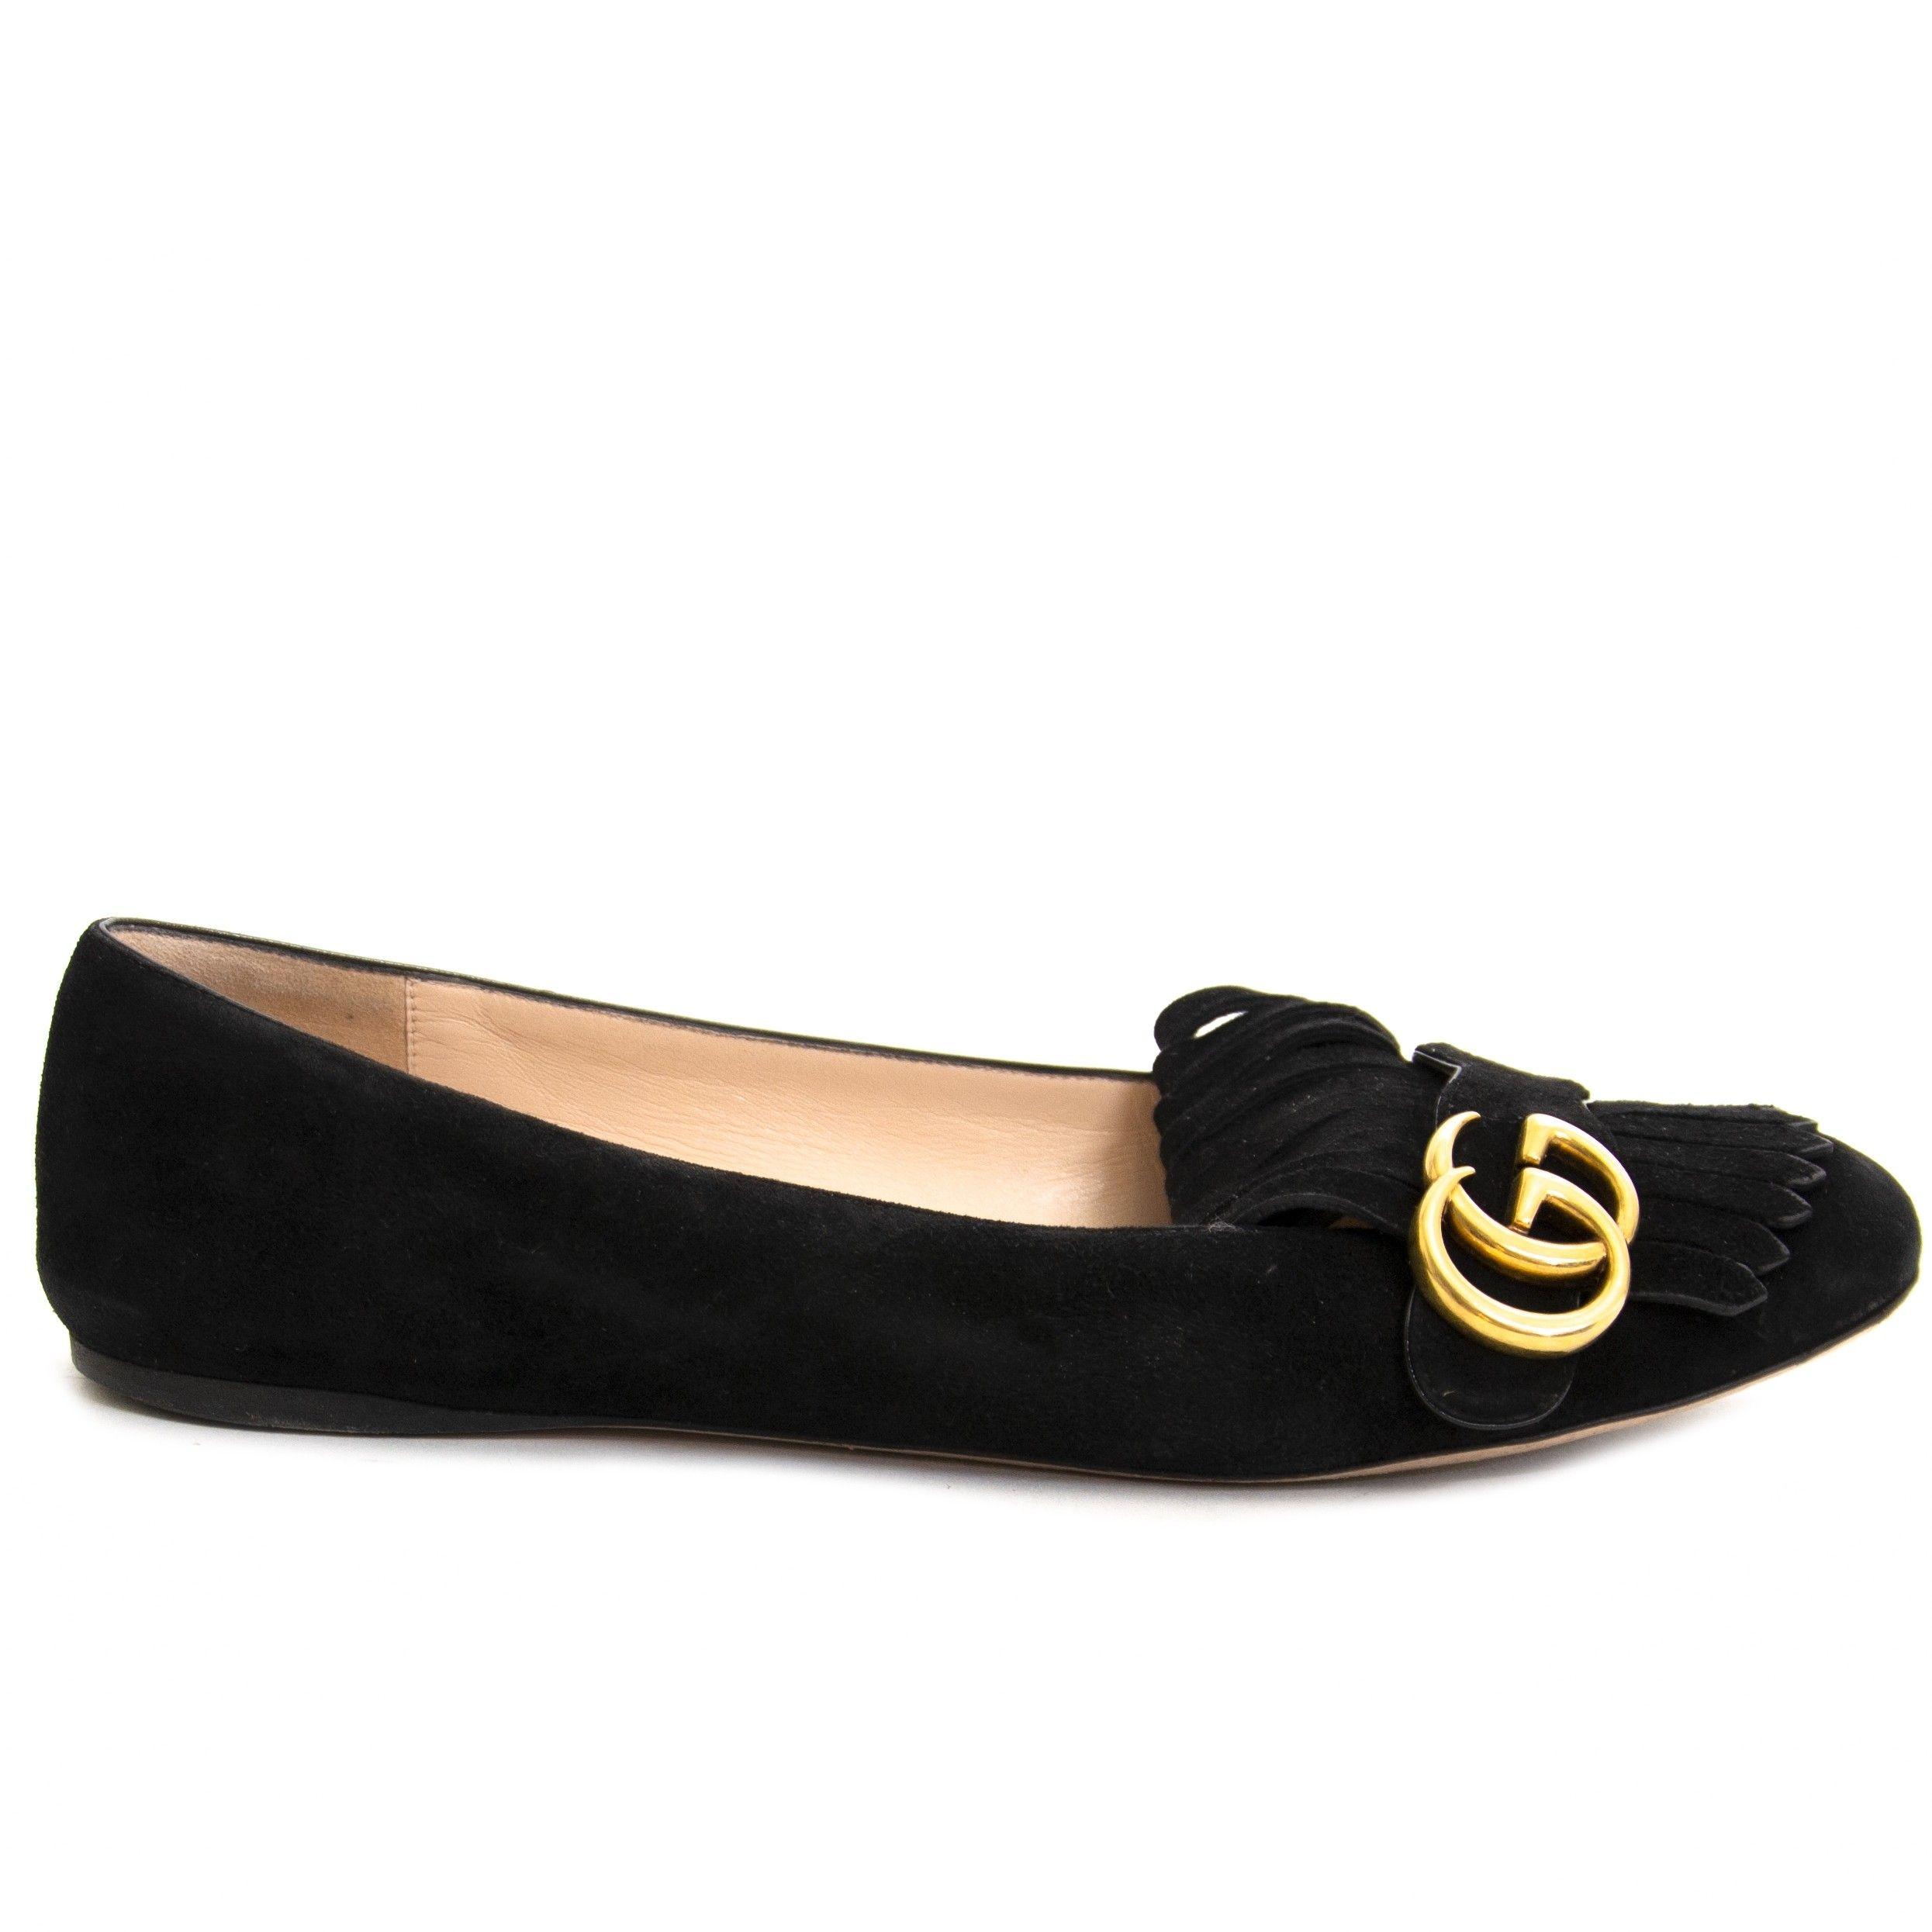 4796ca9316d581 Gucci Marmont Suede Ballet Flats - size 39,5   Shop Labellov in 2019 ...